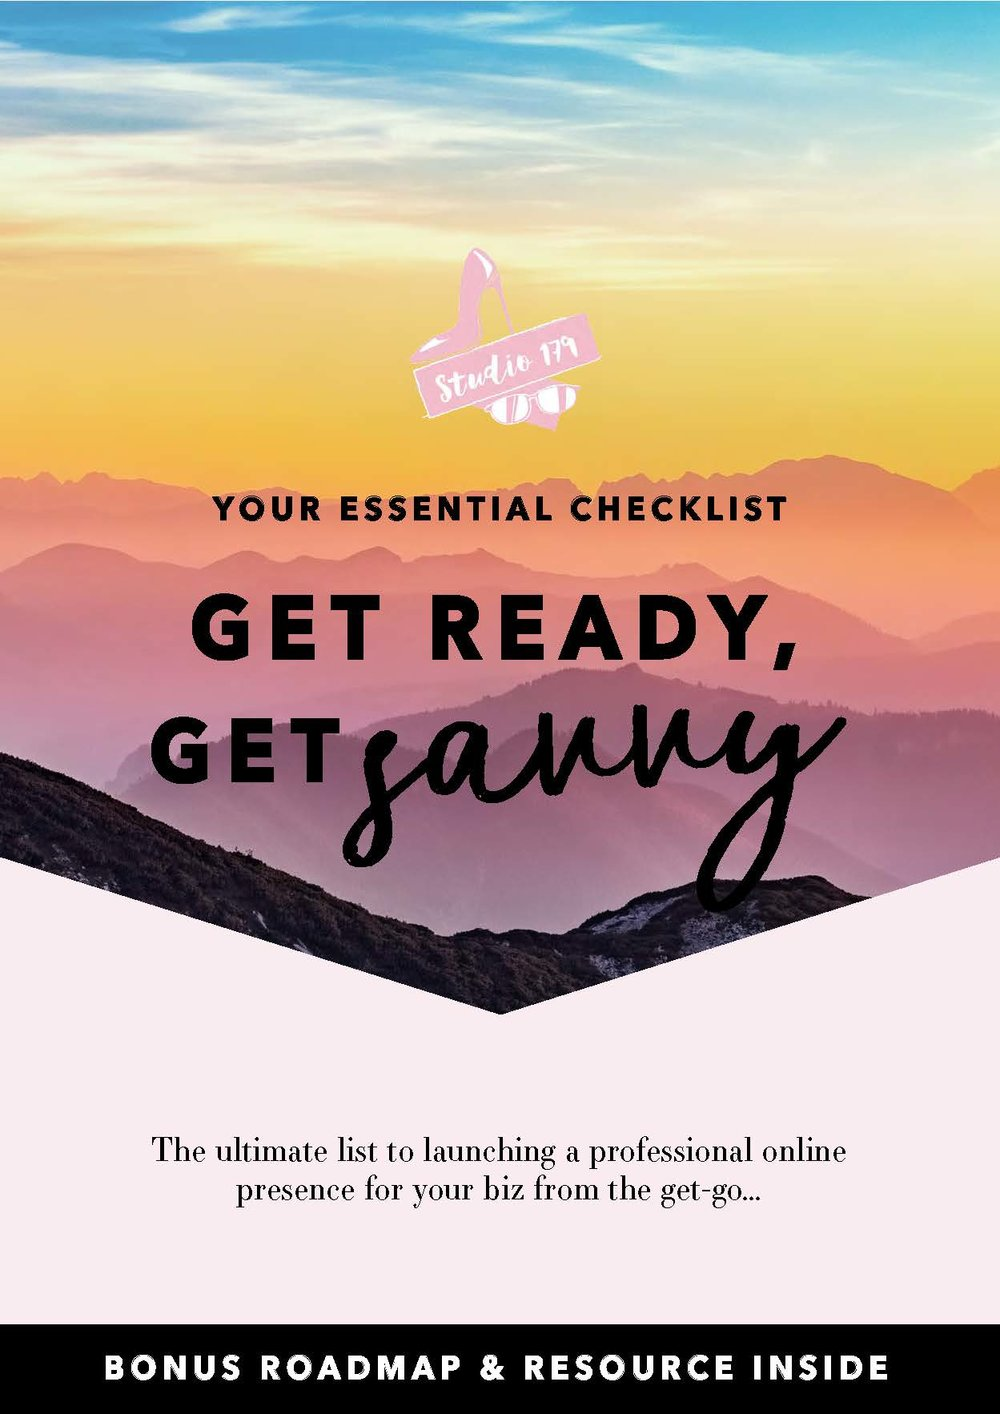 Get Ready Get Savvy Checklist by Studio179_Page_1.jpg